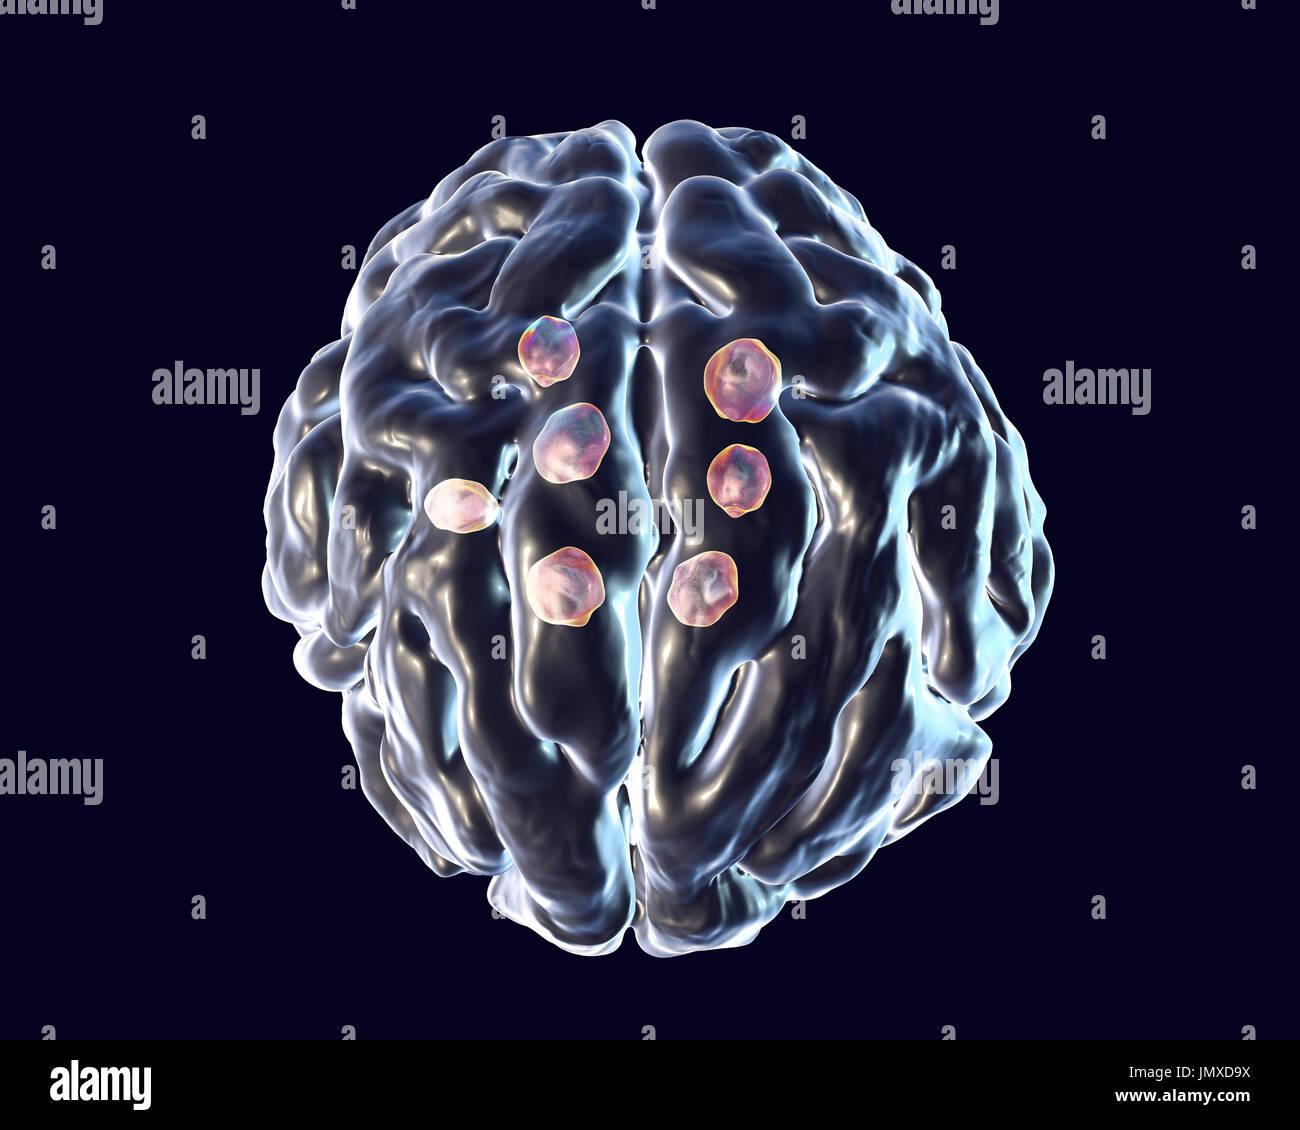 cryptococcal brain lesions illustration of multiple brain